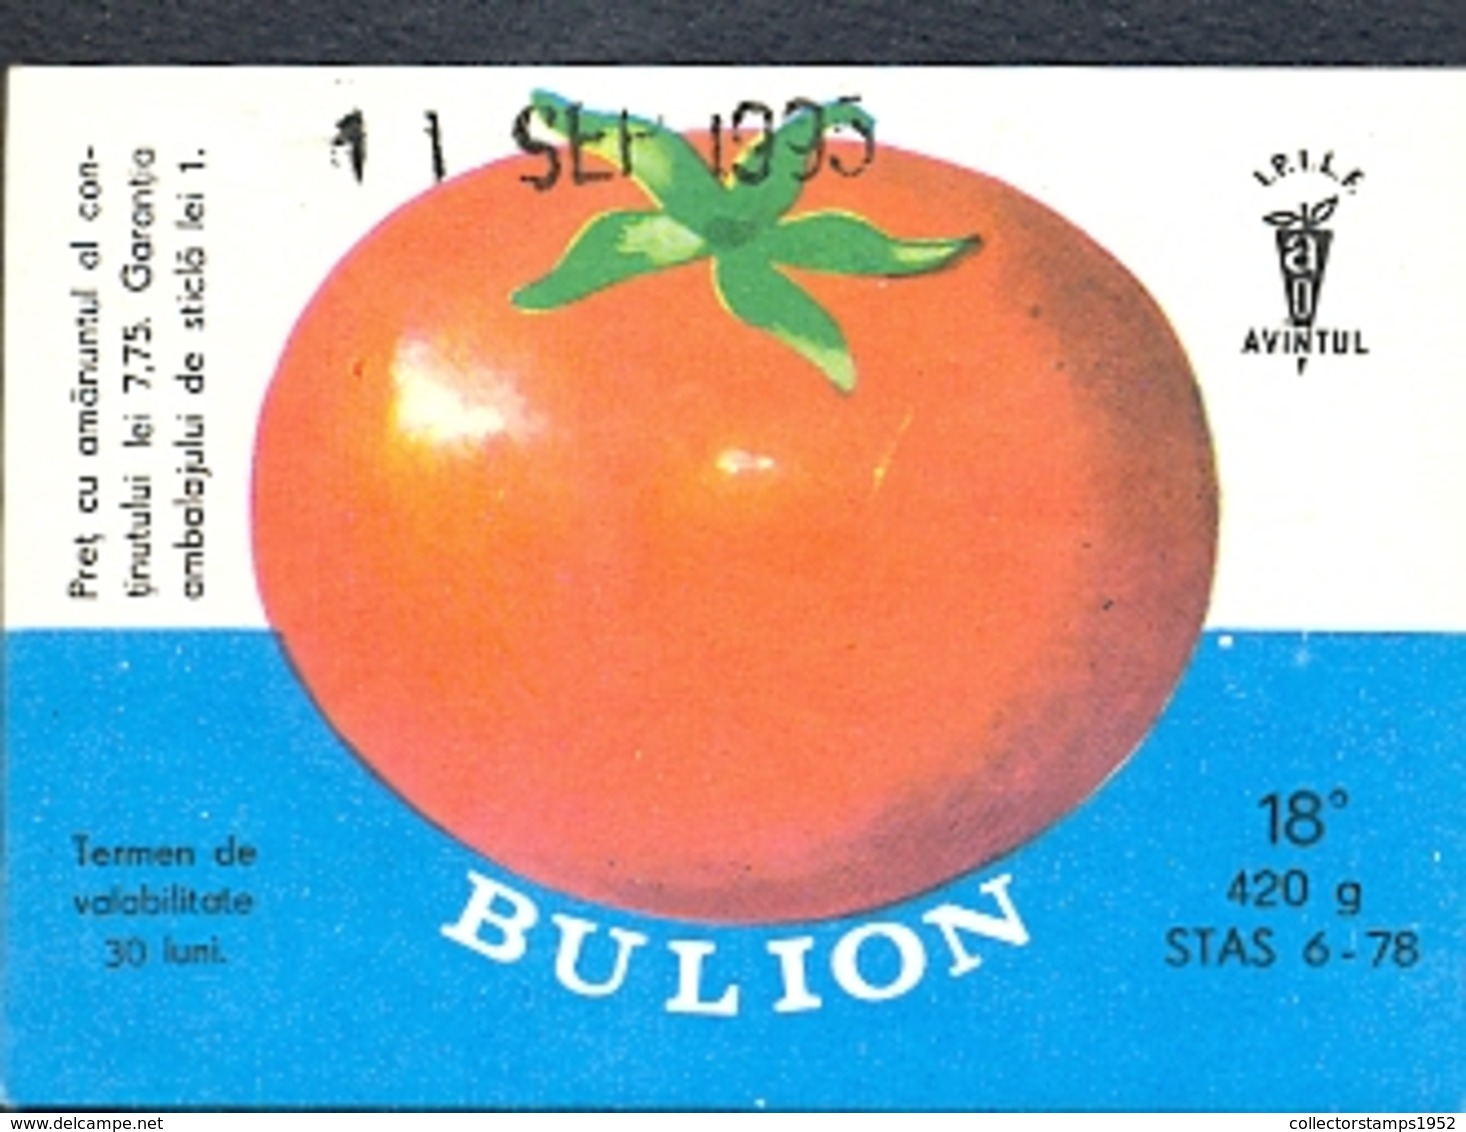 78495- TOMATO SAUCE, LABELS, 1995, ROMANIA - Frutas Y Legumbres